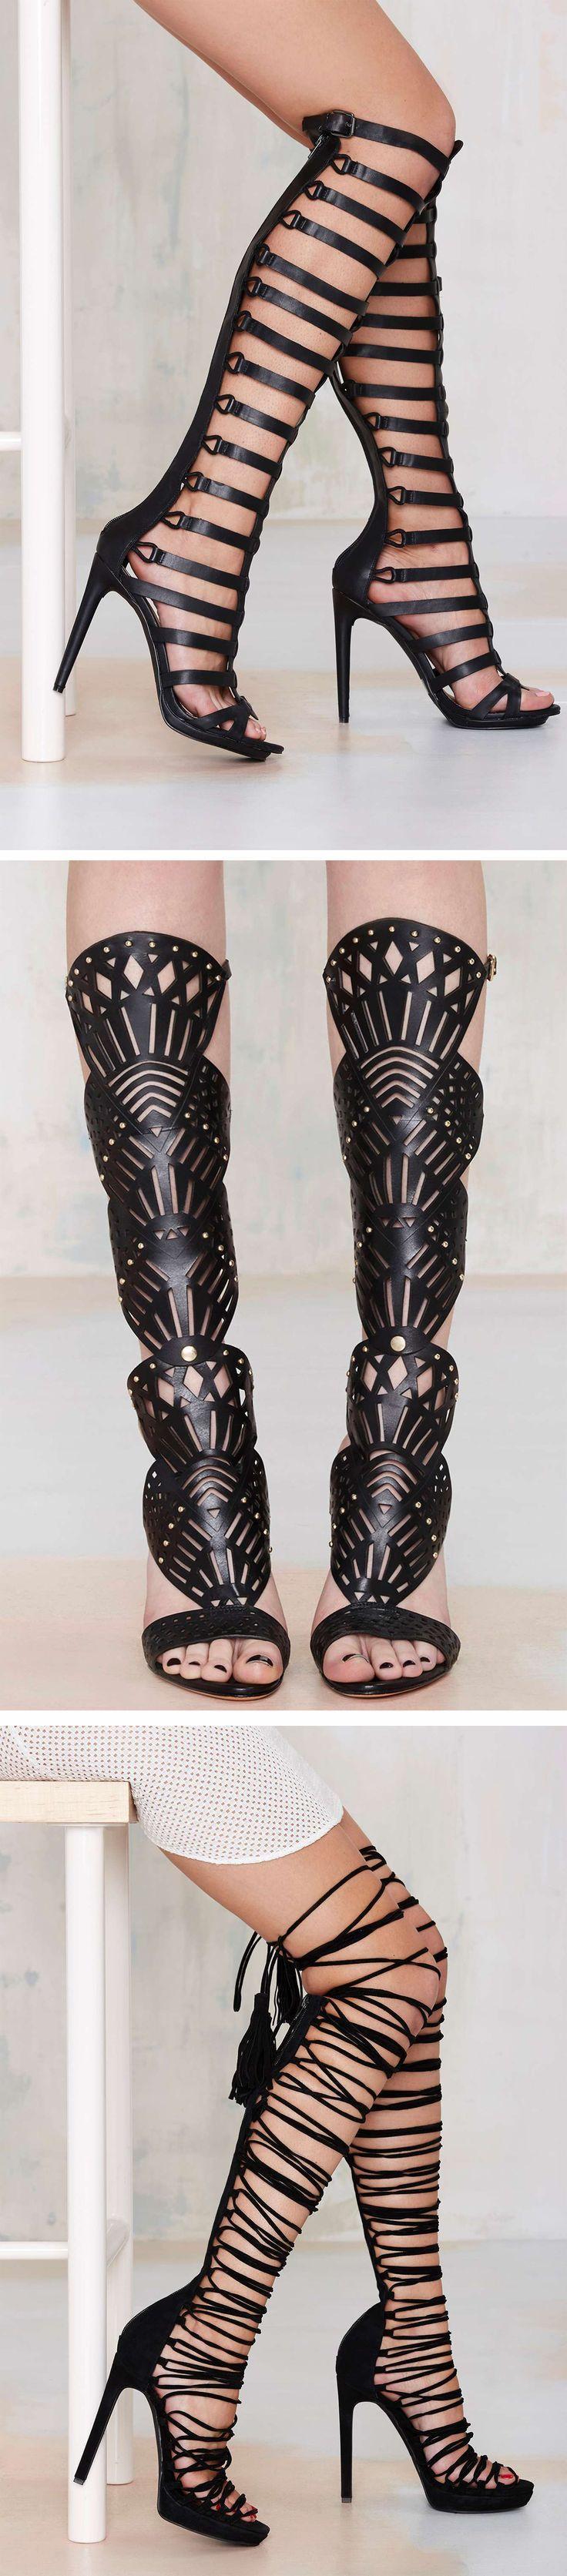 Boda - Gladiator Sandals